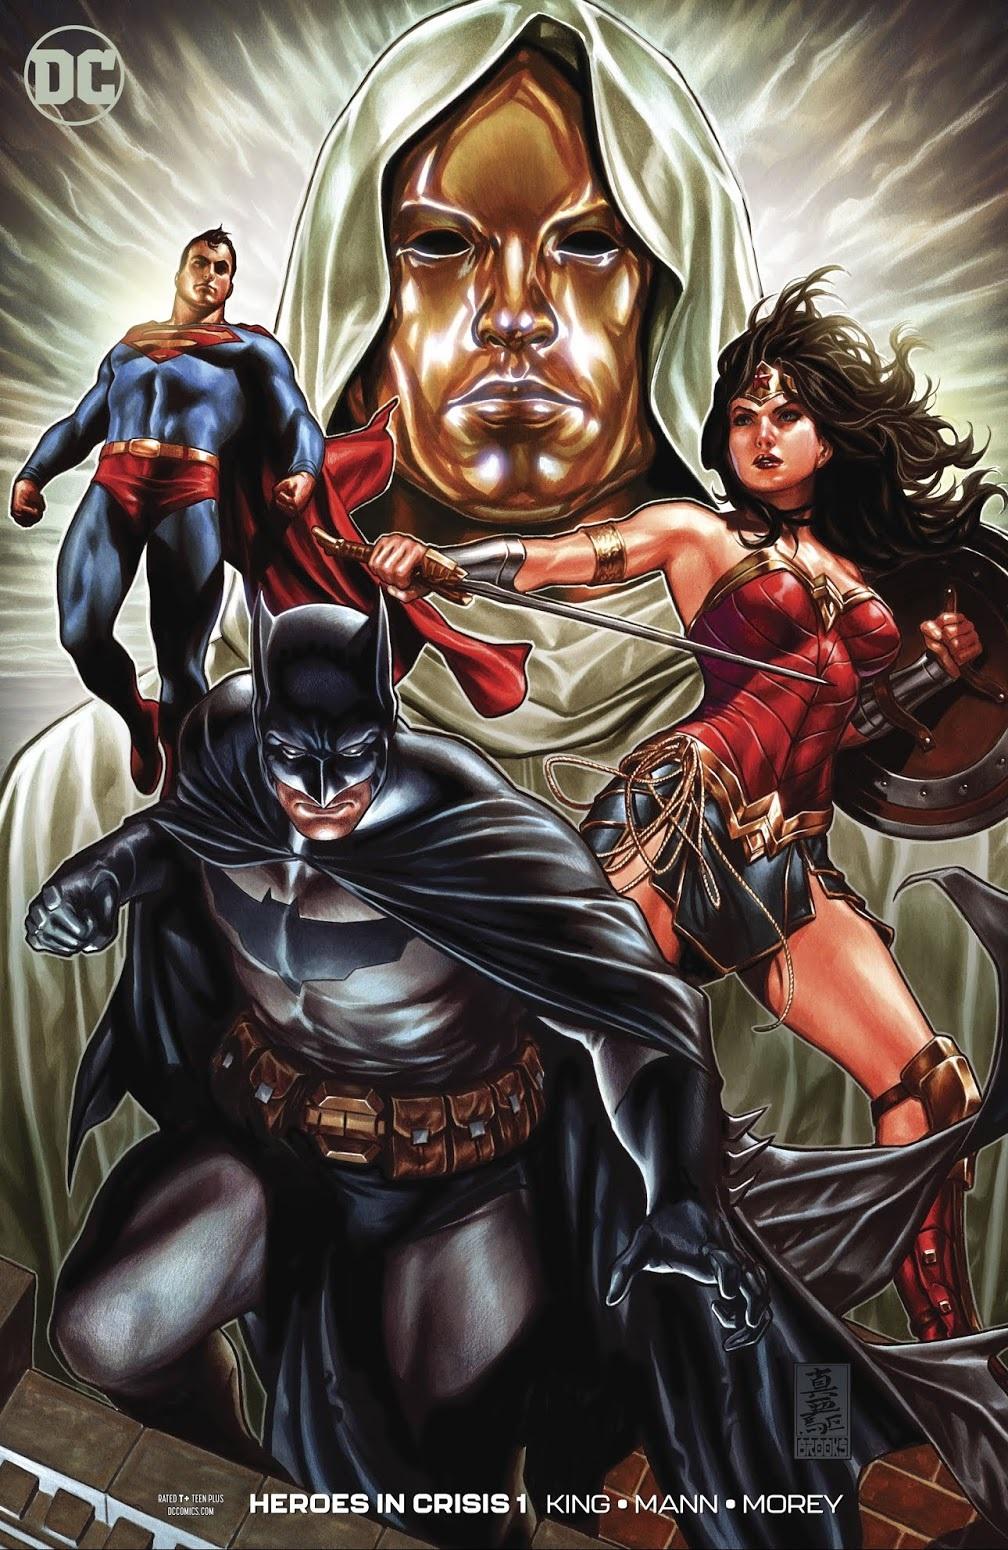 COMIC BOOK FAN AND LOVER: HÉROES EN CRISIS # 1 – DC COMICS